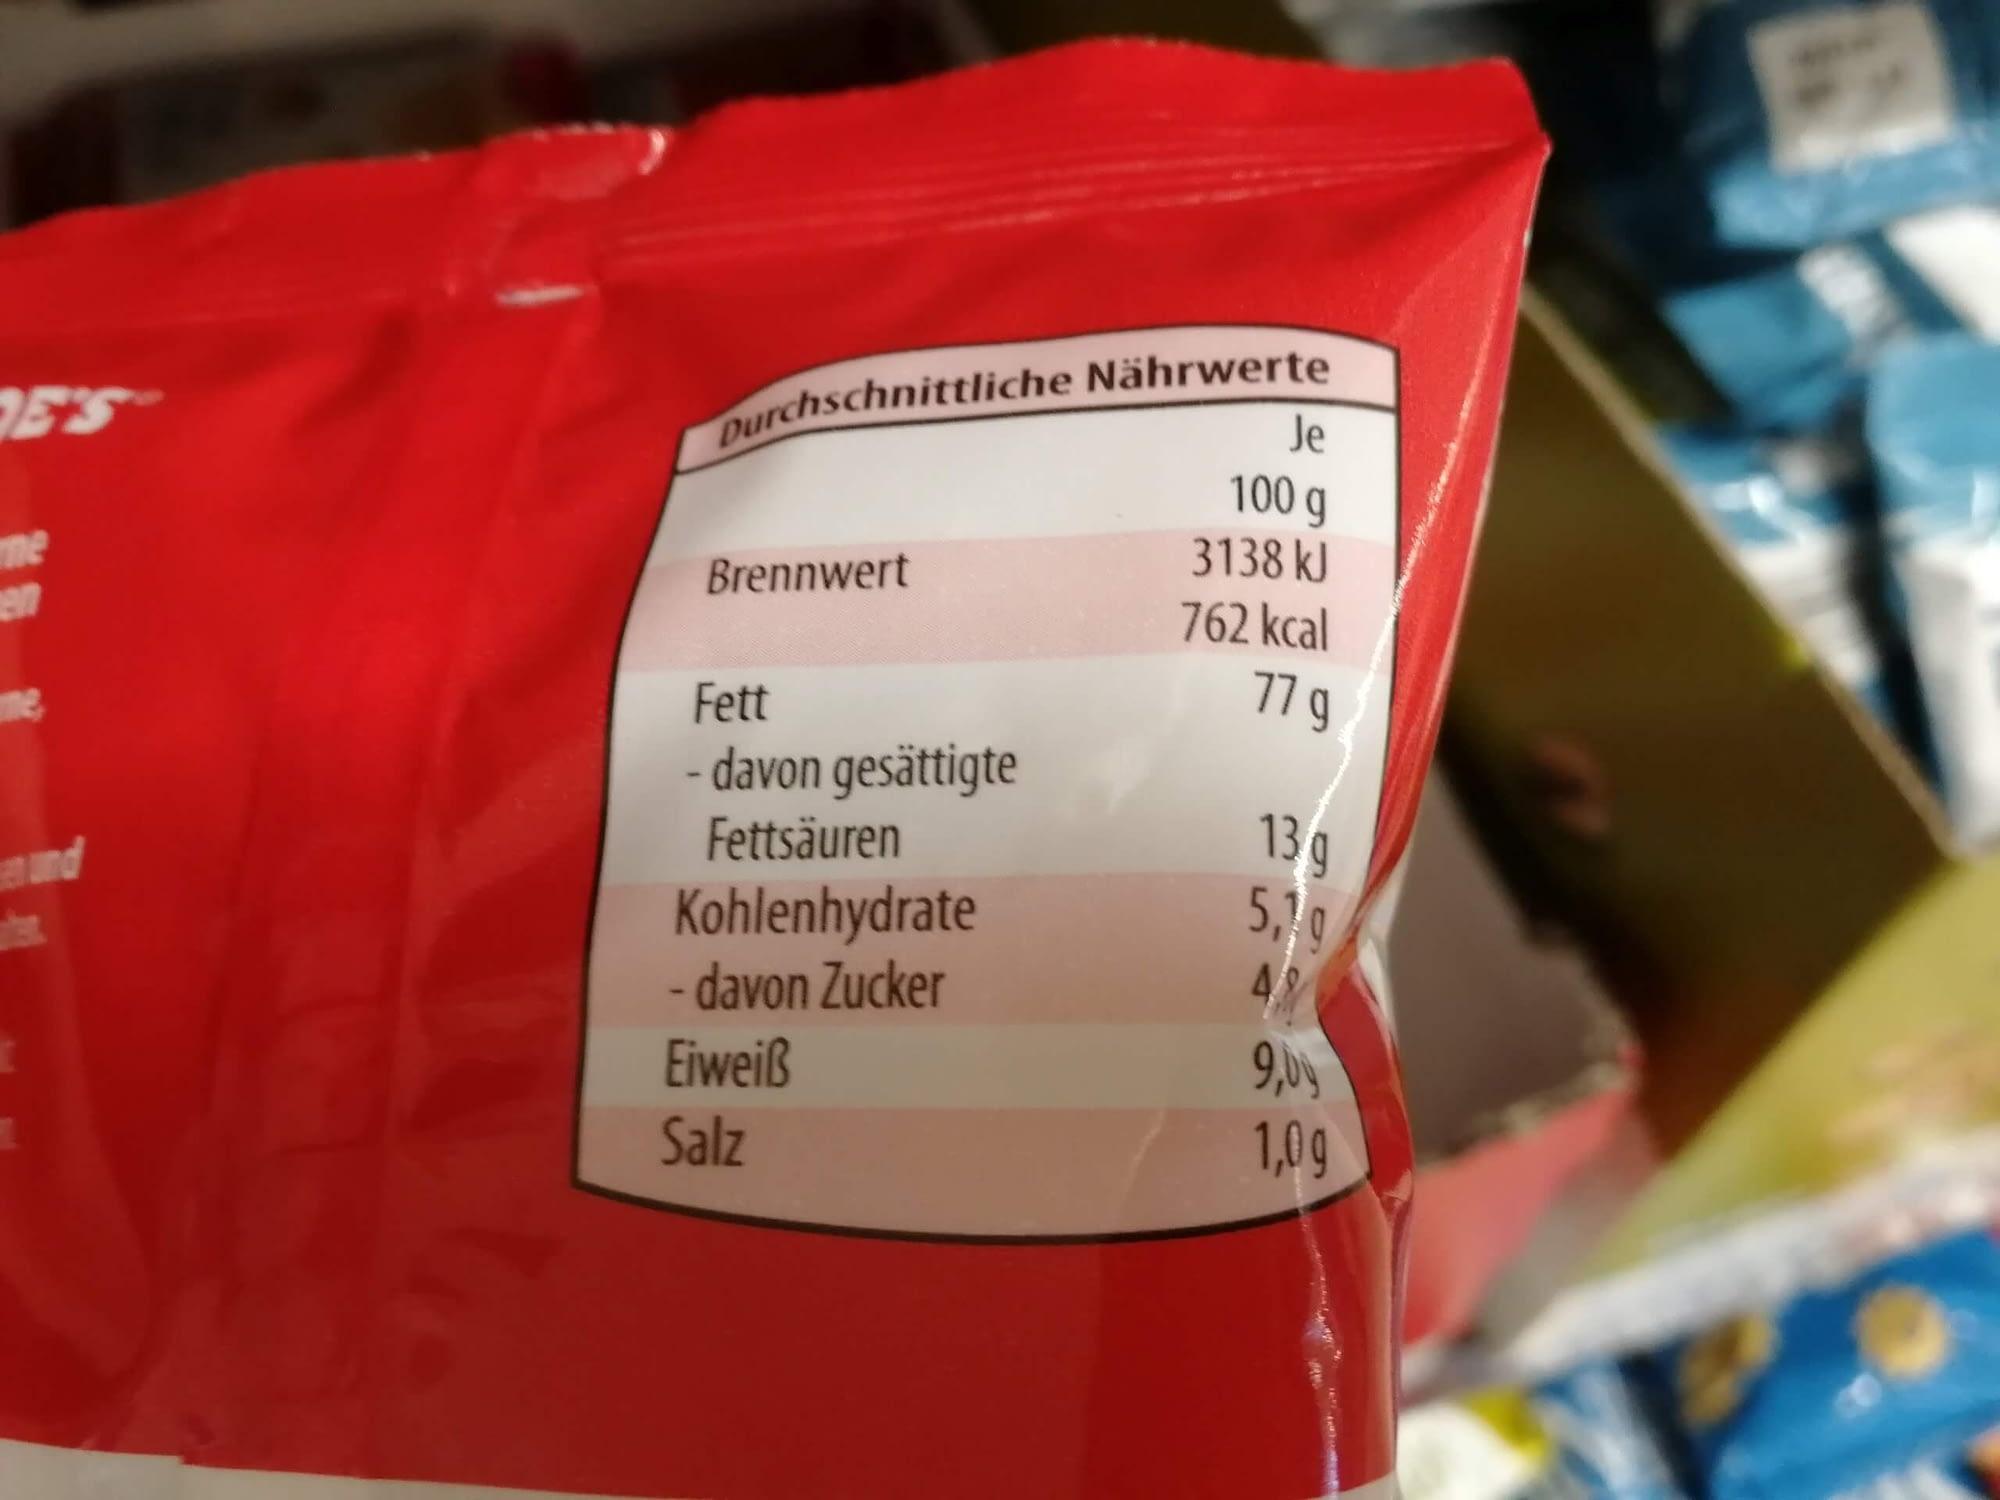 Keto-Snack-Aldi-Macadamia-Nährwerte